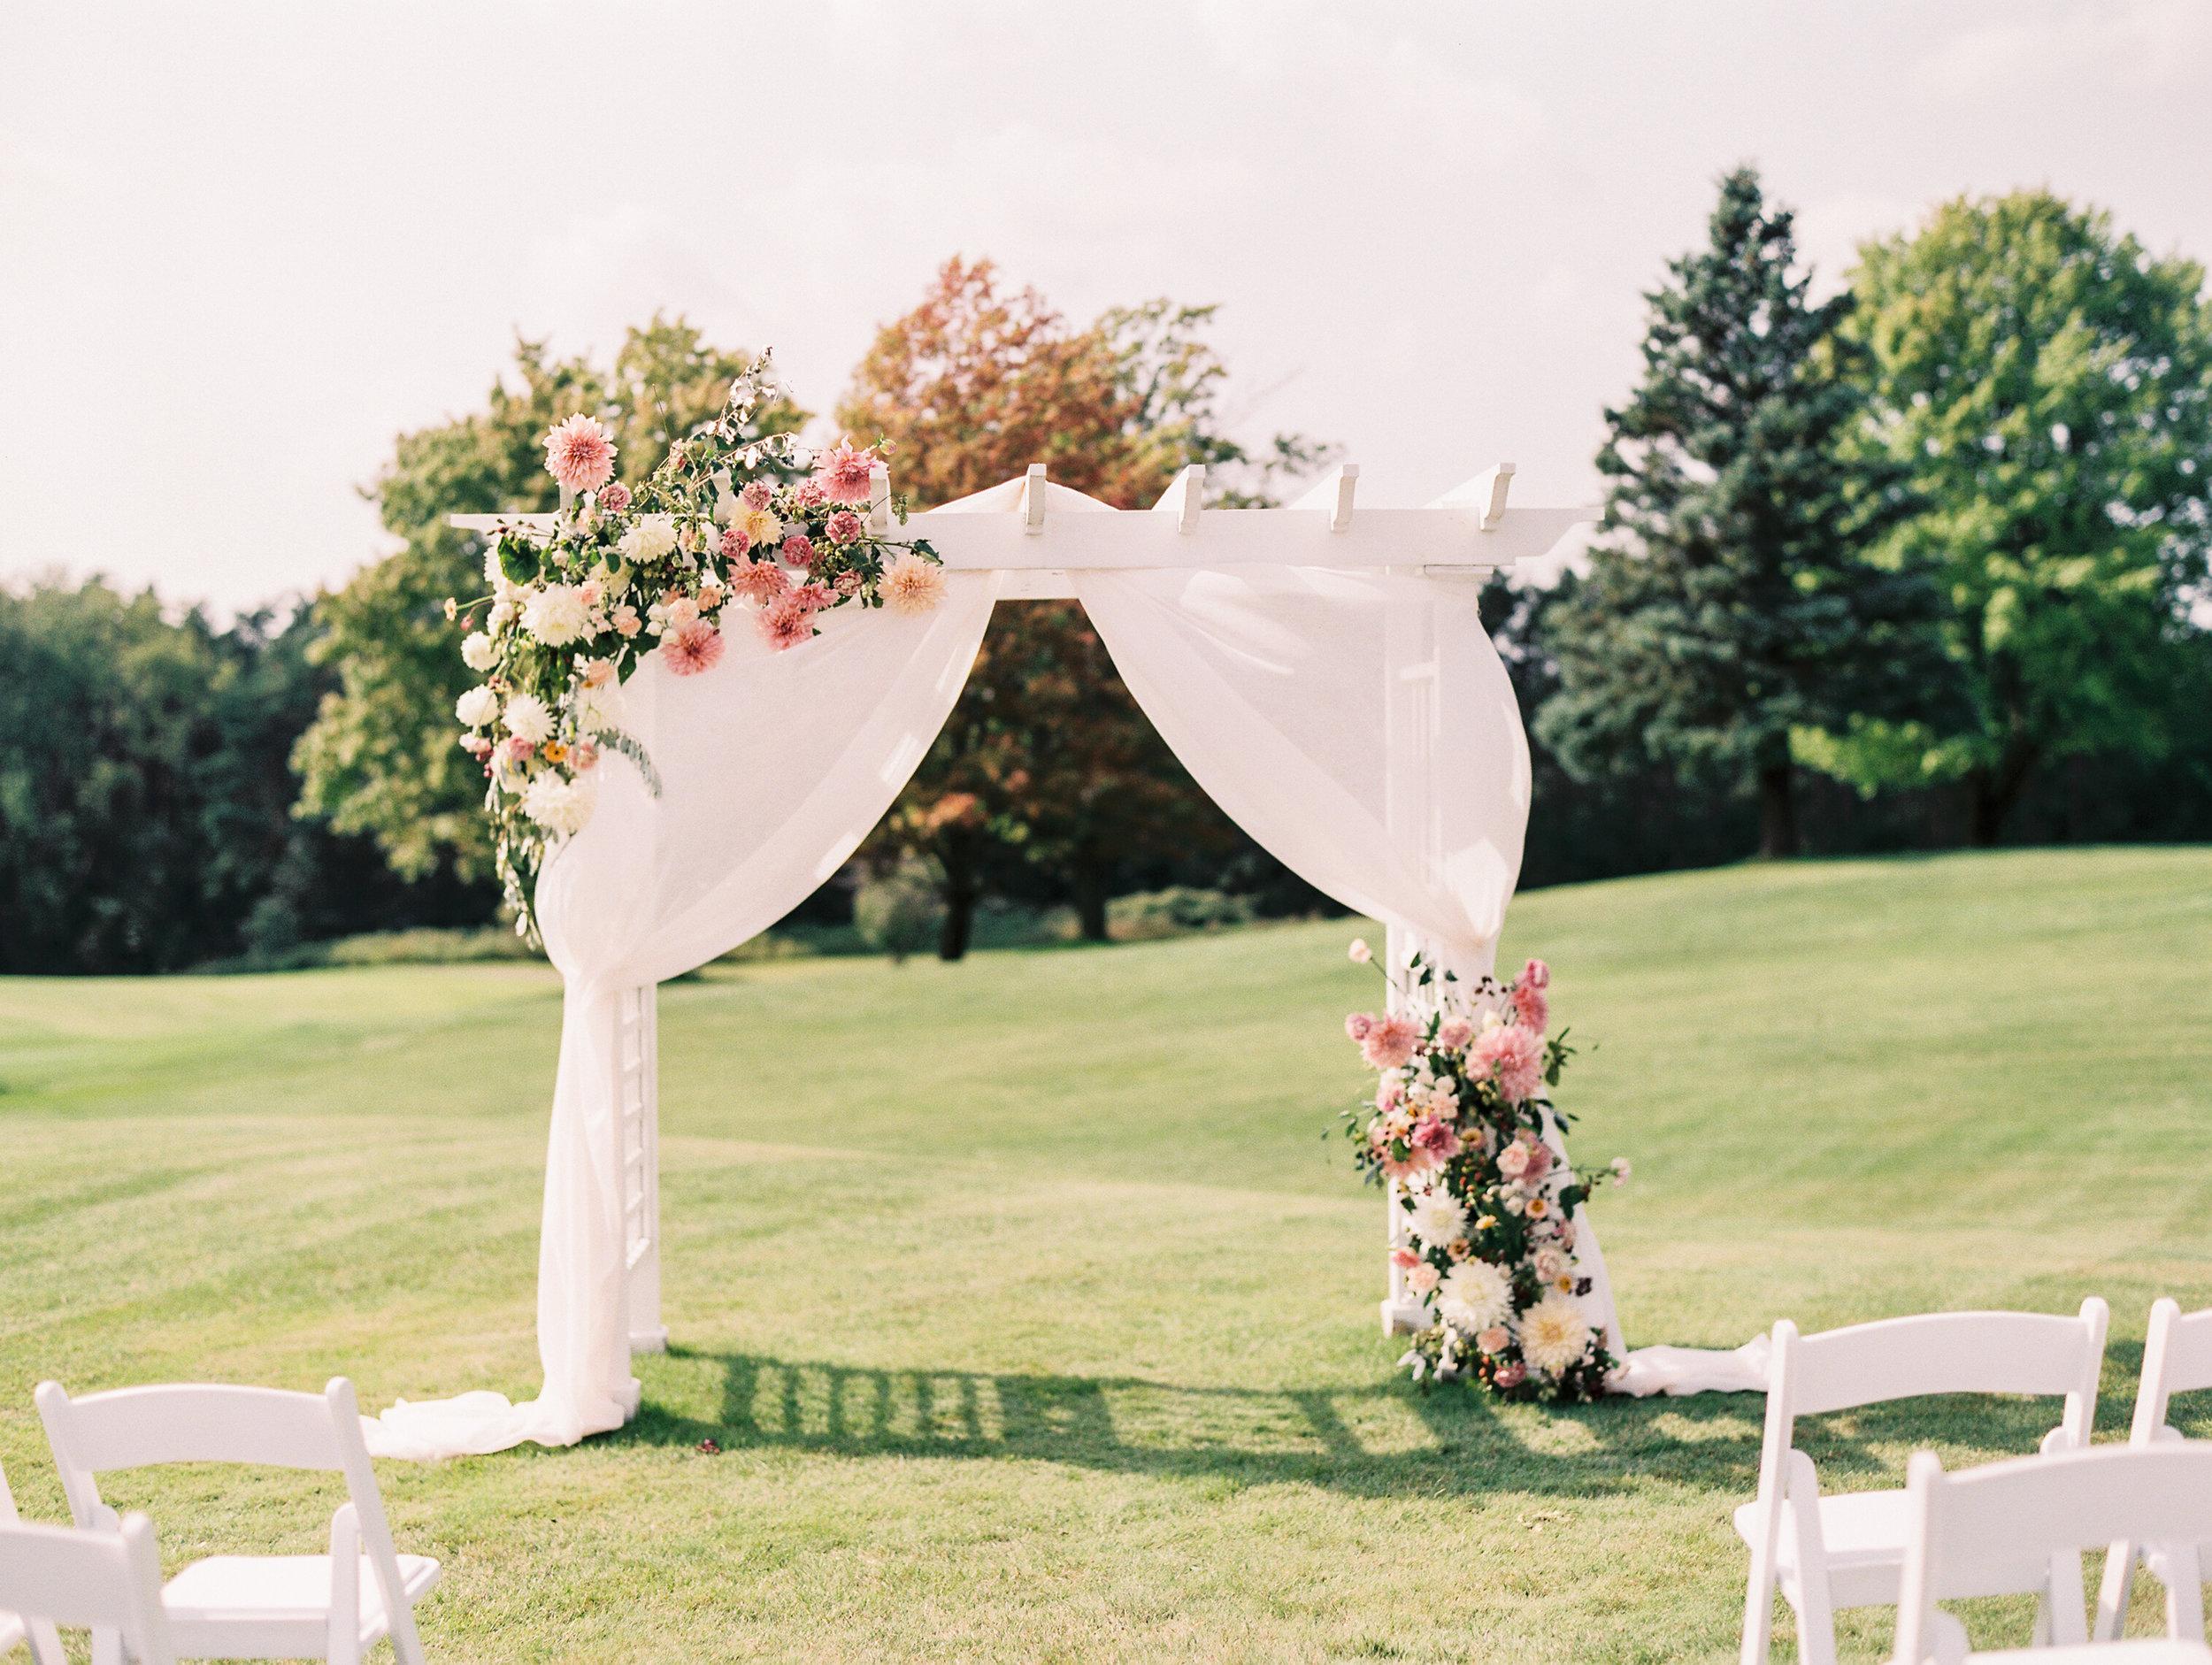 Zoller+Wedding+Ceremonyf-12.jpg